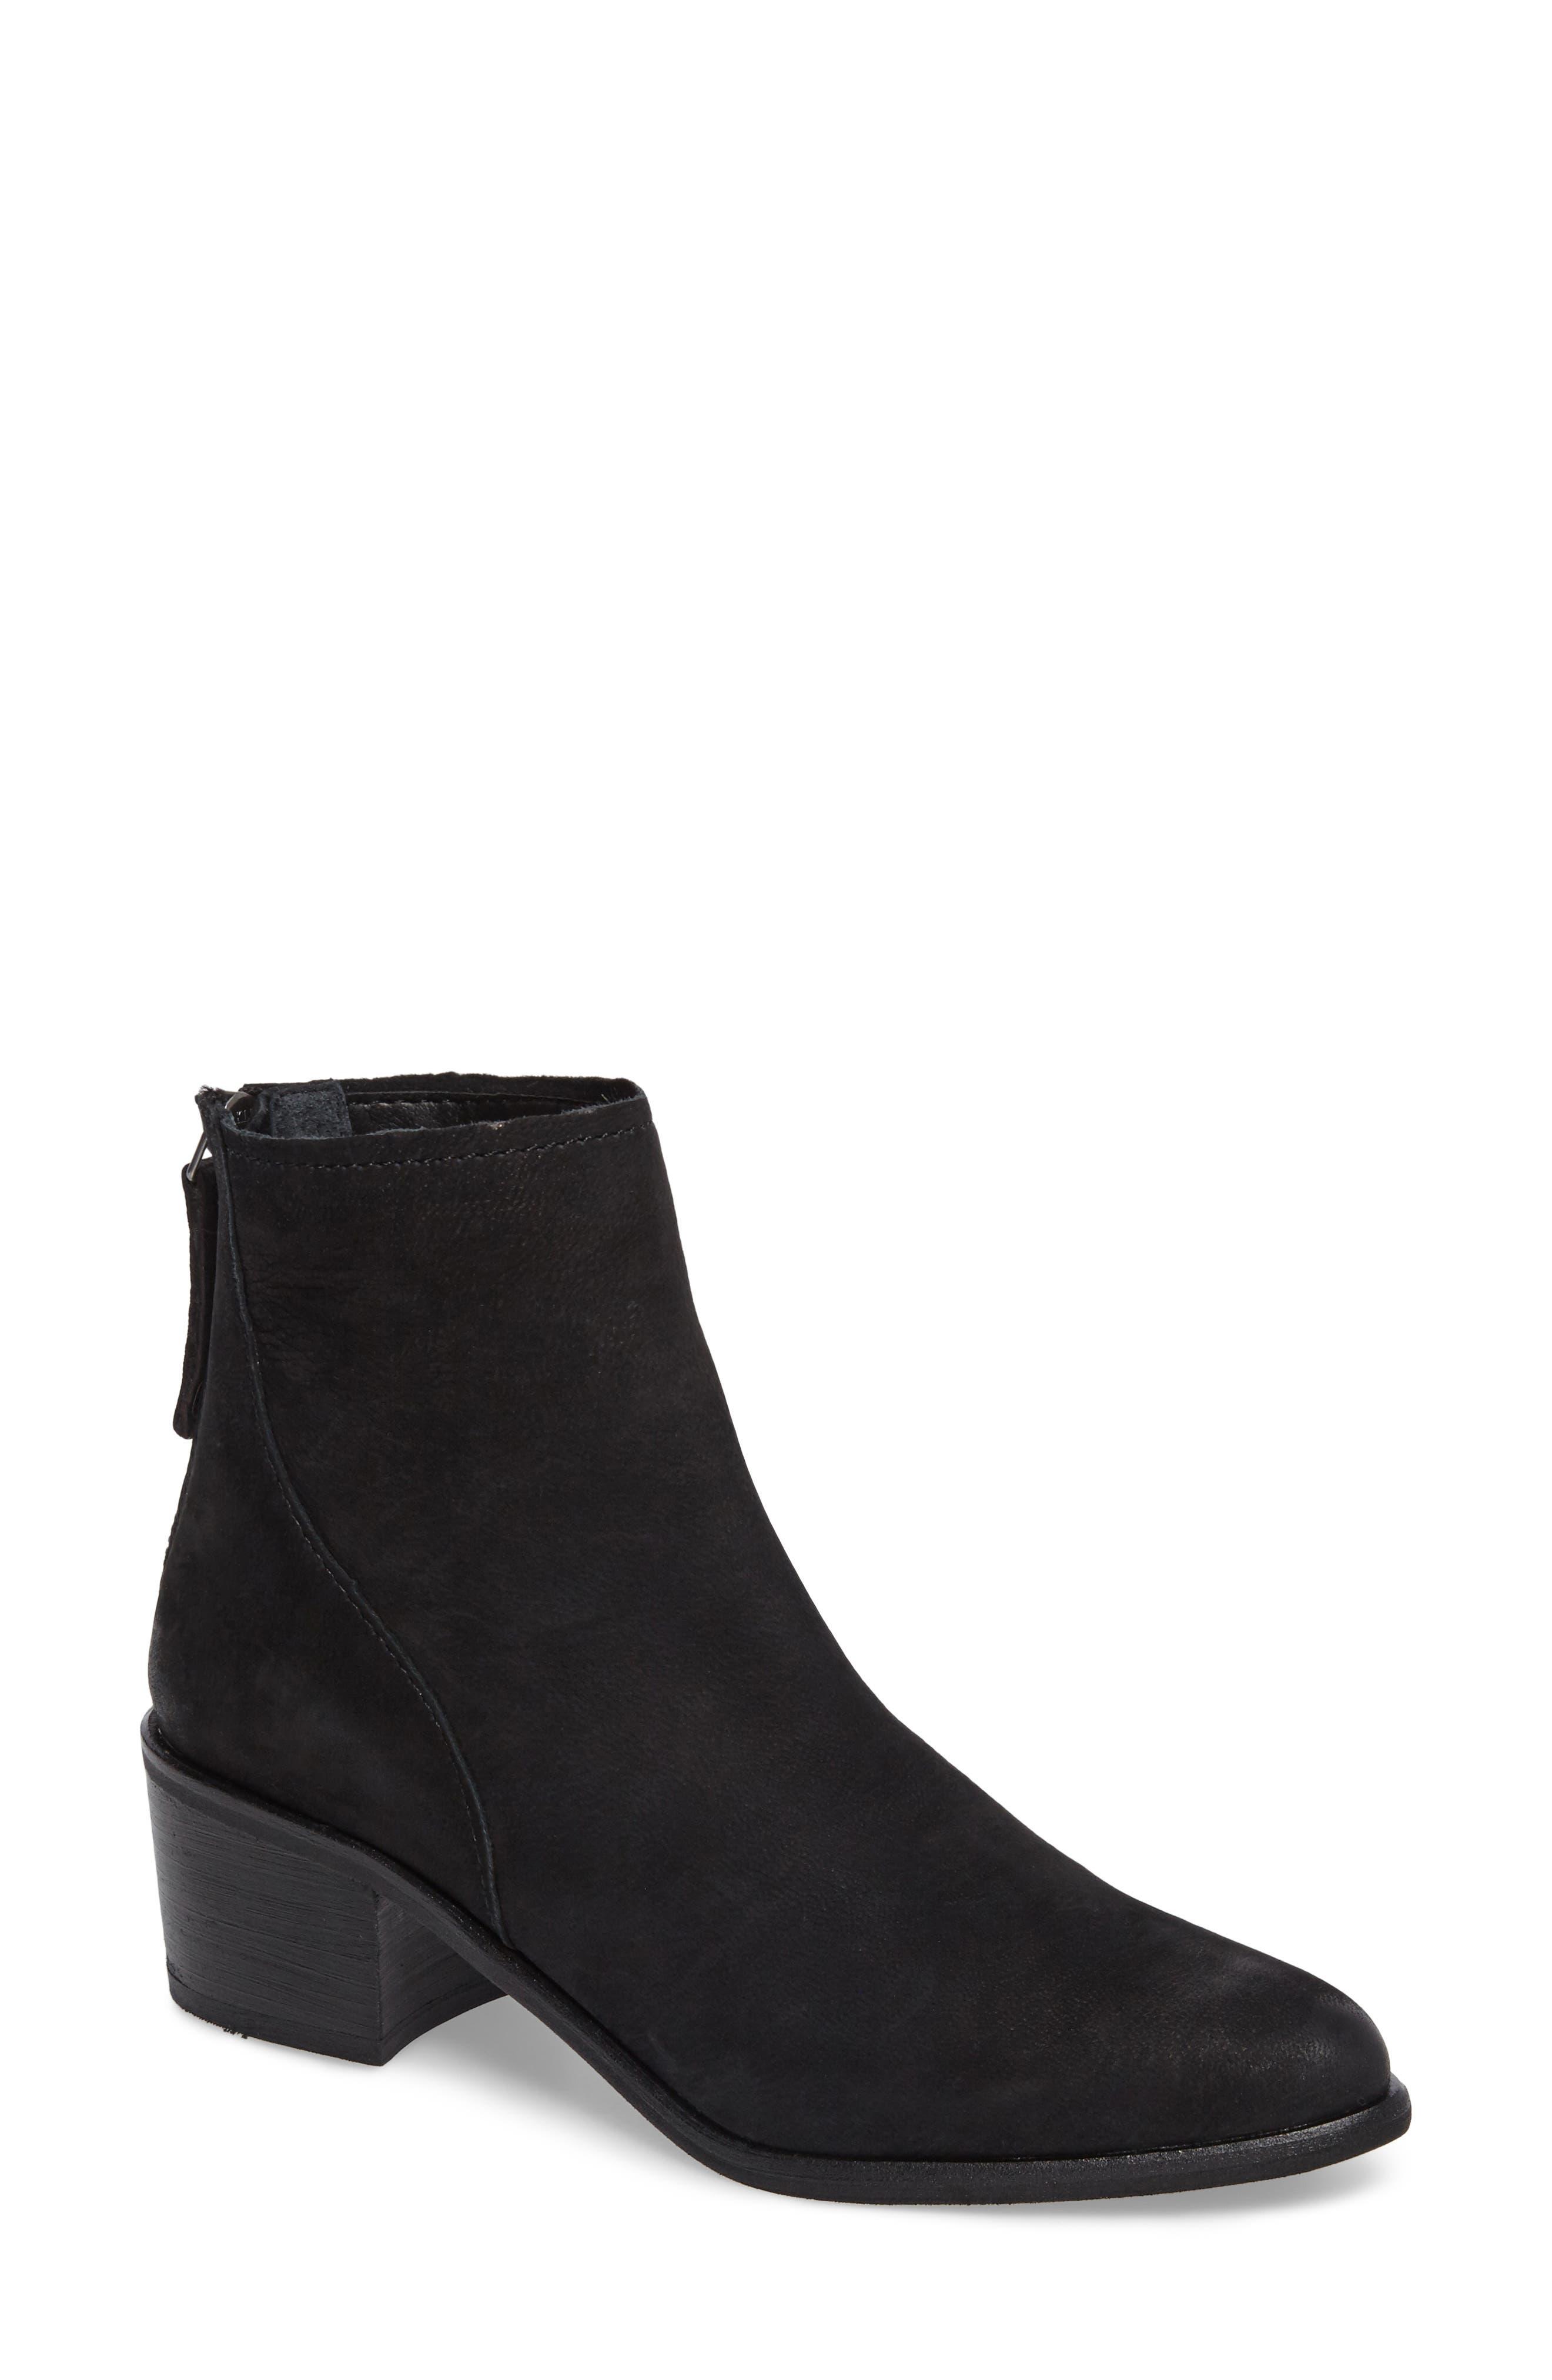 Cassius Block Heel Bootie,                             Main thumbnail 1, color,                             Black Nubuck Leather